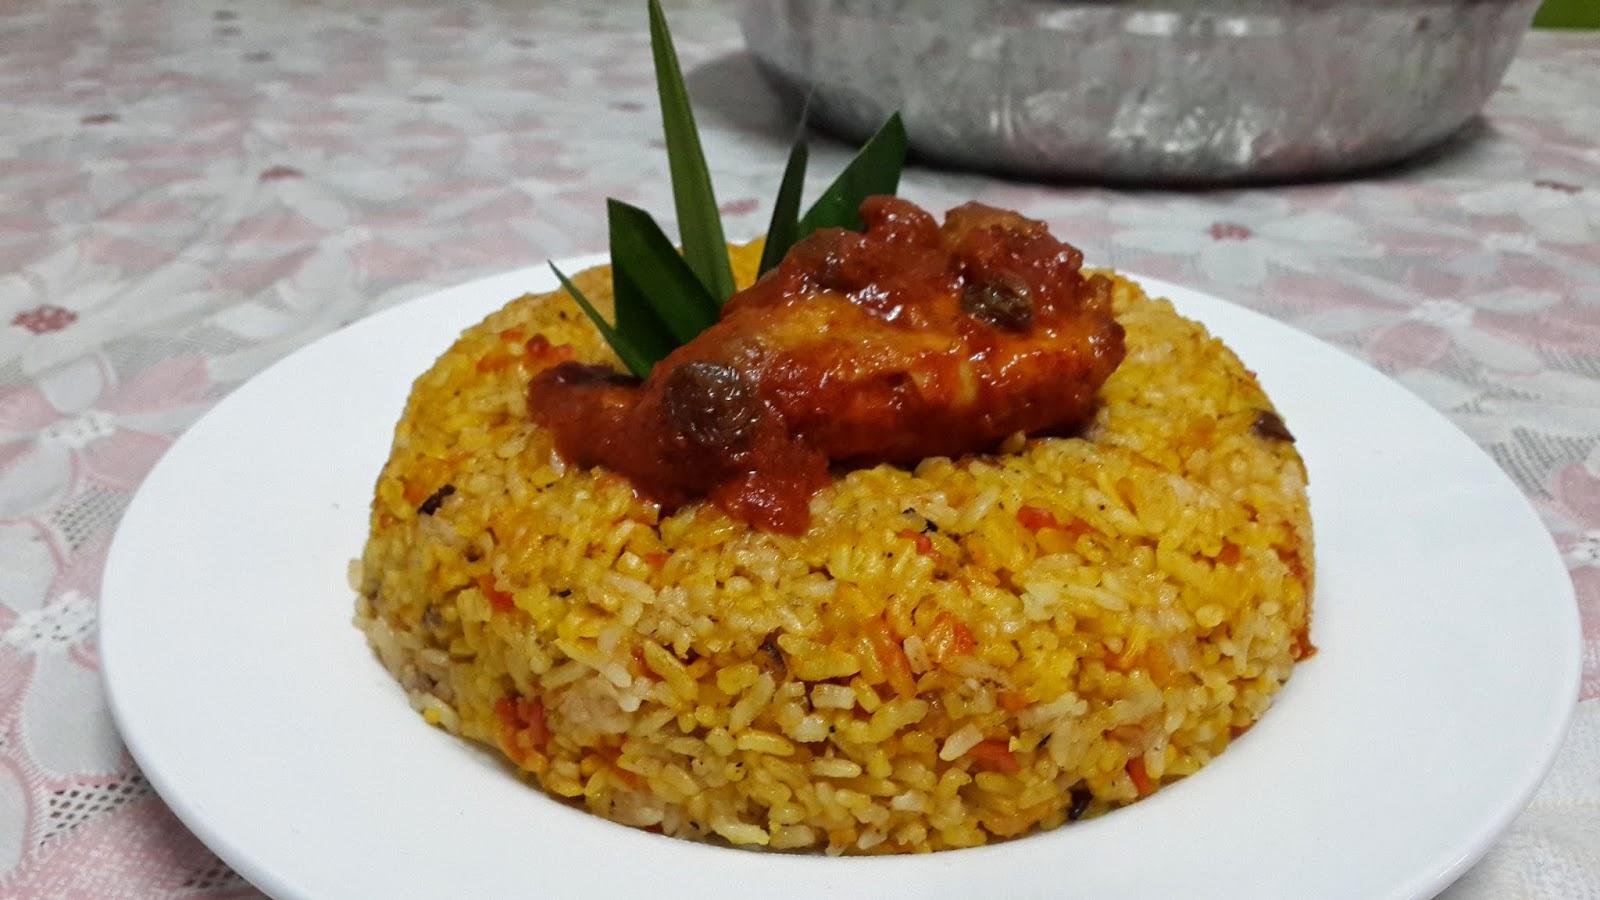 Sajian Dapur Bonda Resepi Periuk Noa Nasi Tomato Mamak Penang